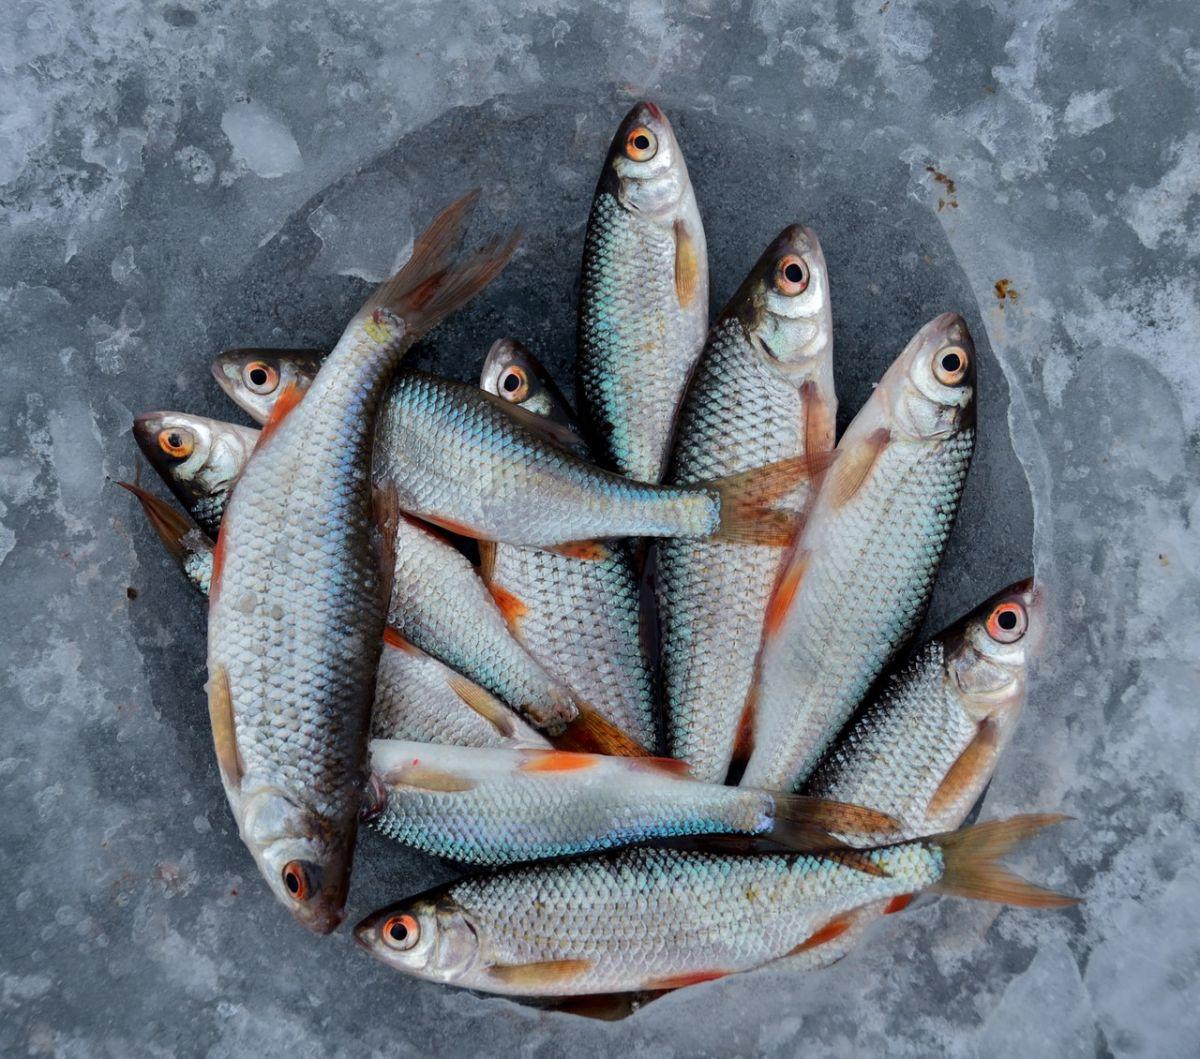 7 pescados que nunca debes comprar